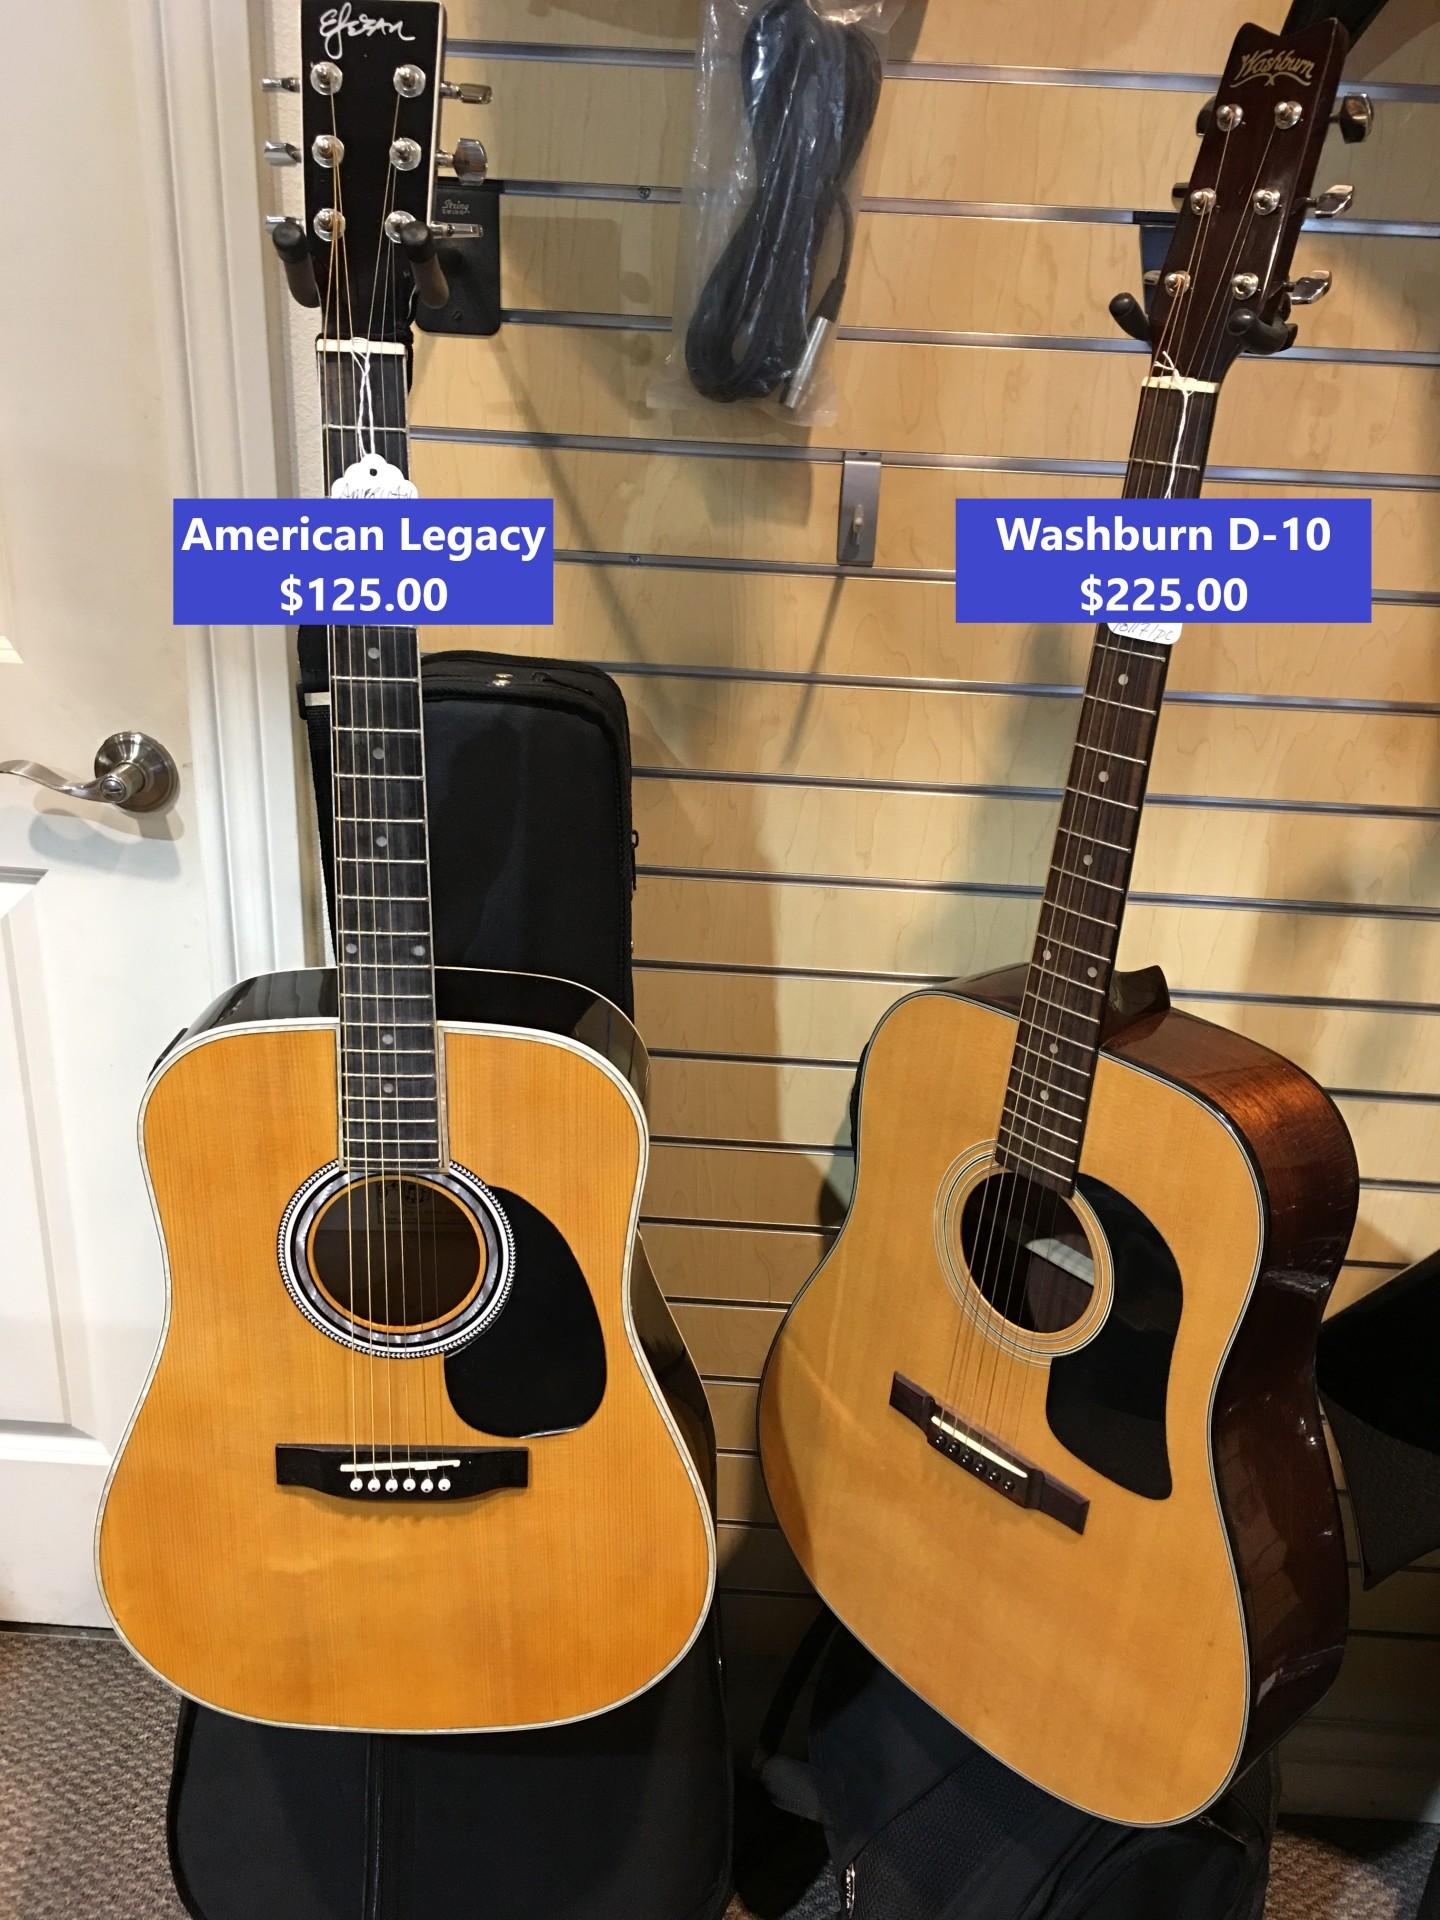 American Legacy & Washburn